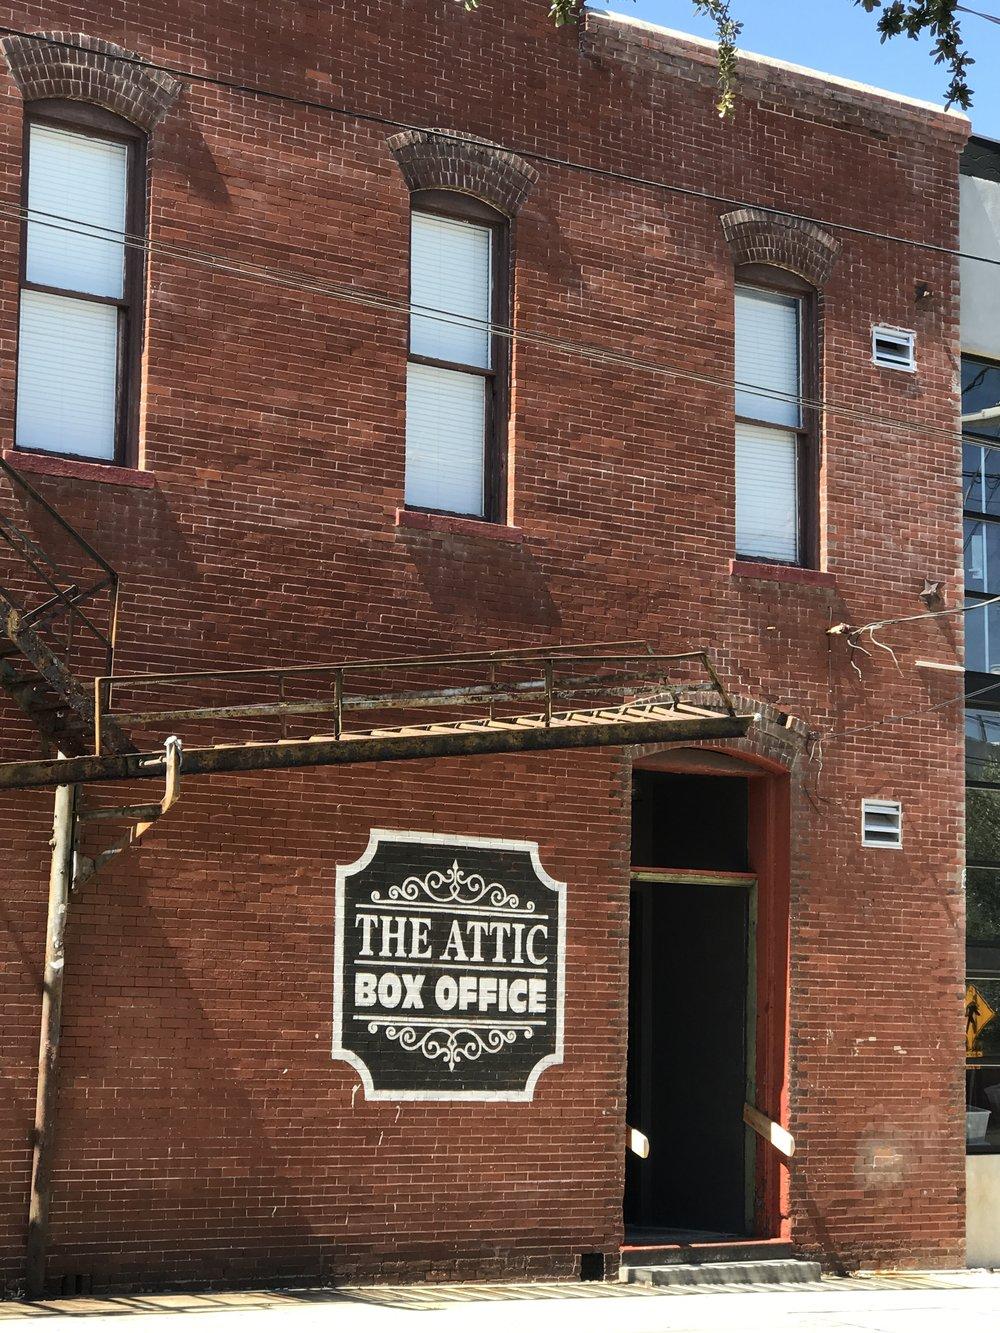 the attic post office in ybor city